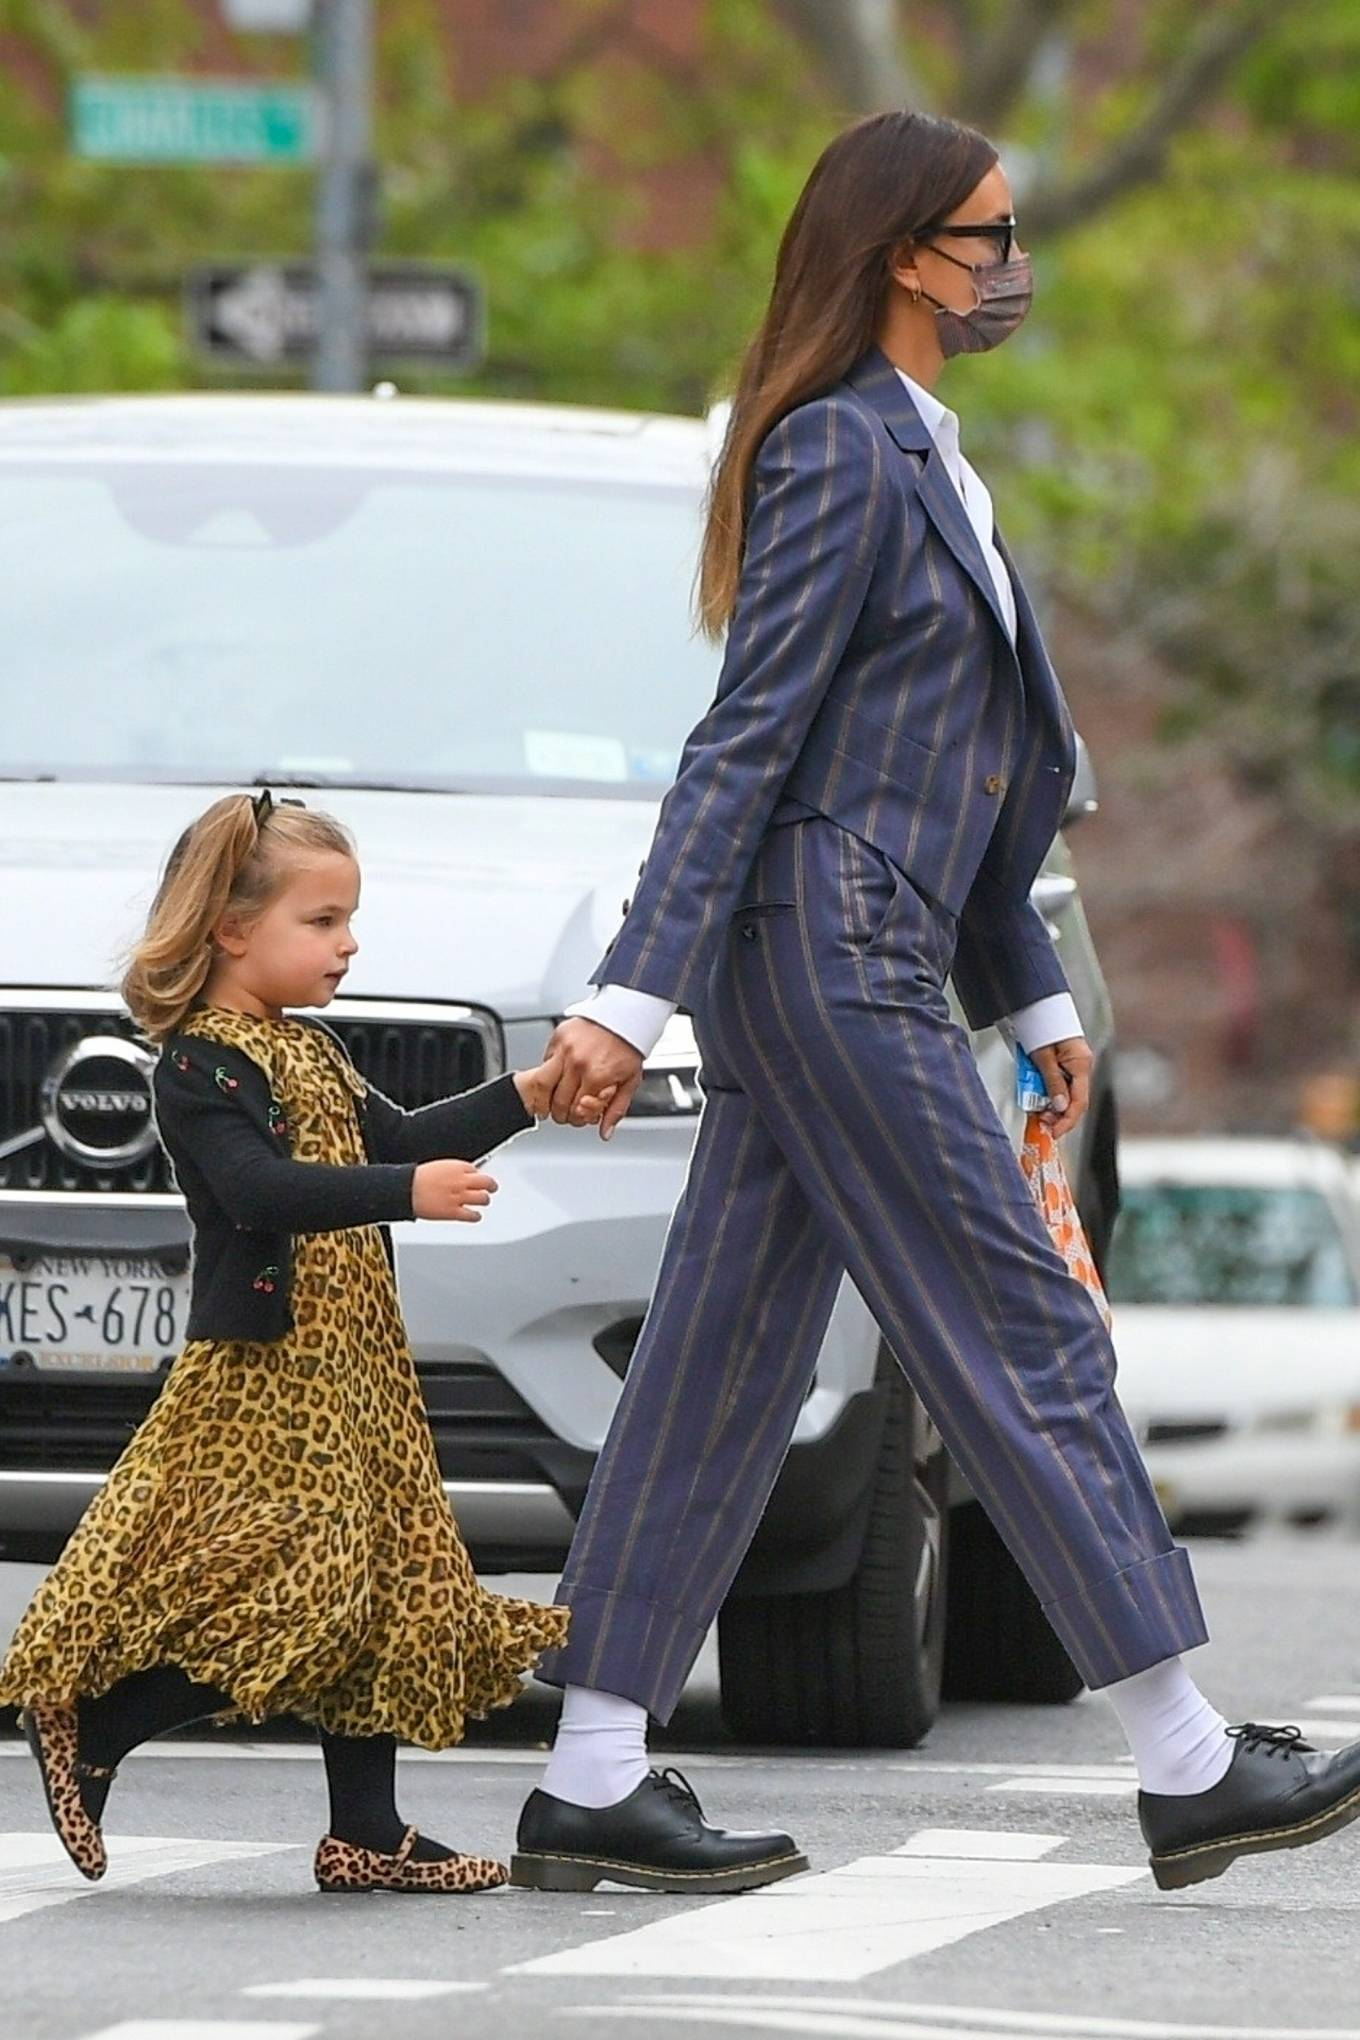 Irina Shayk - seen out with her daughter in Manhattan